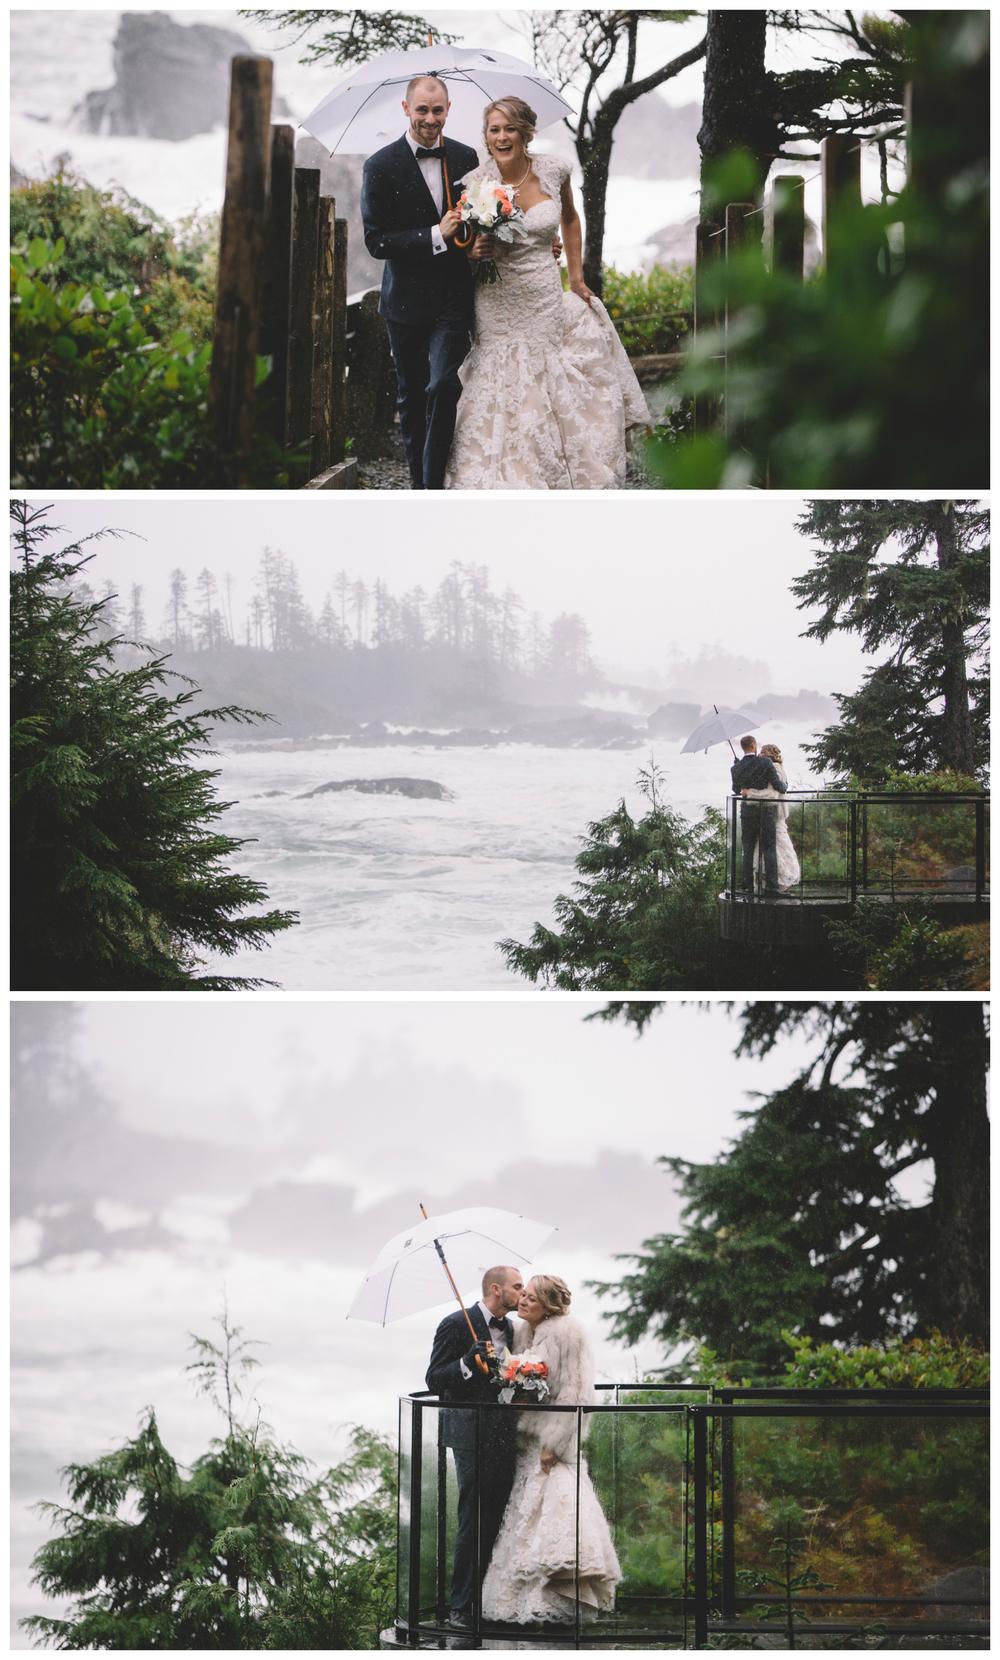 frick-wedding-7.jpg